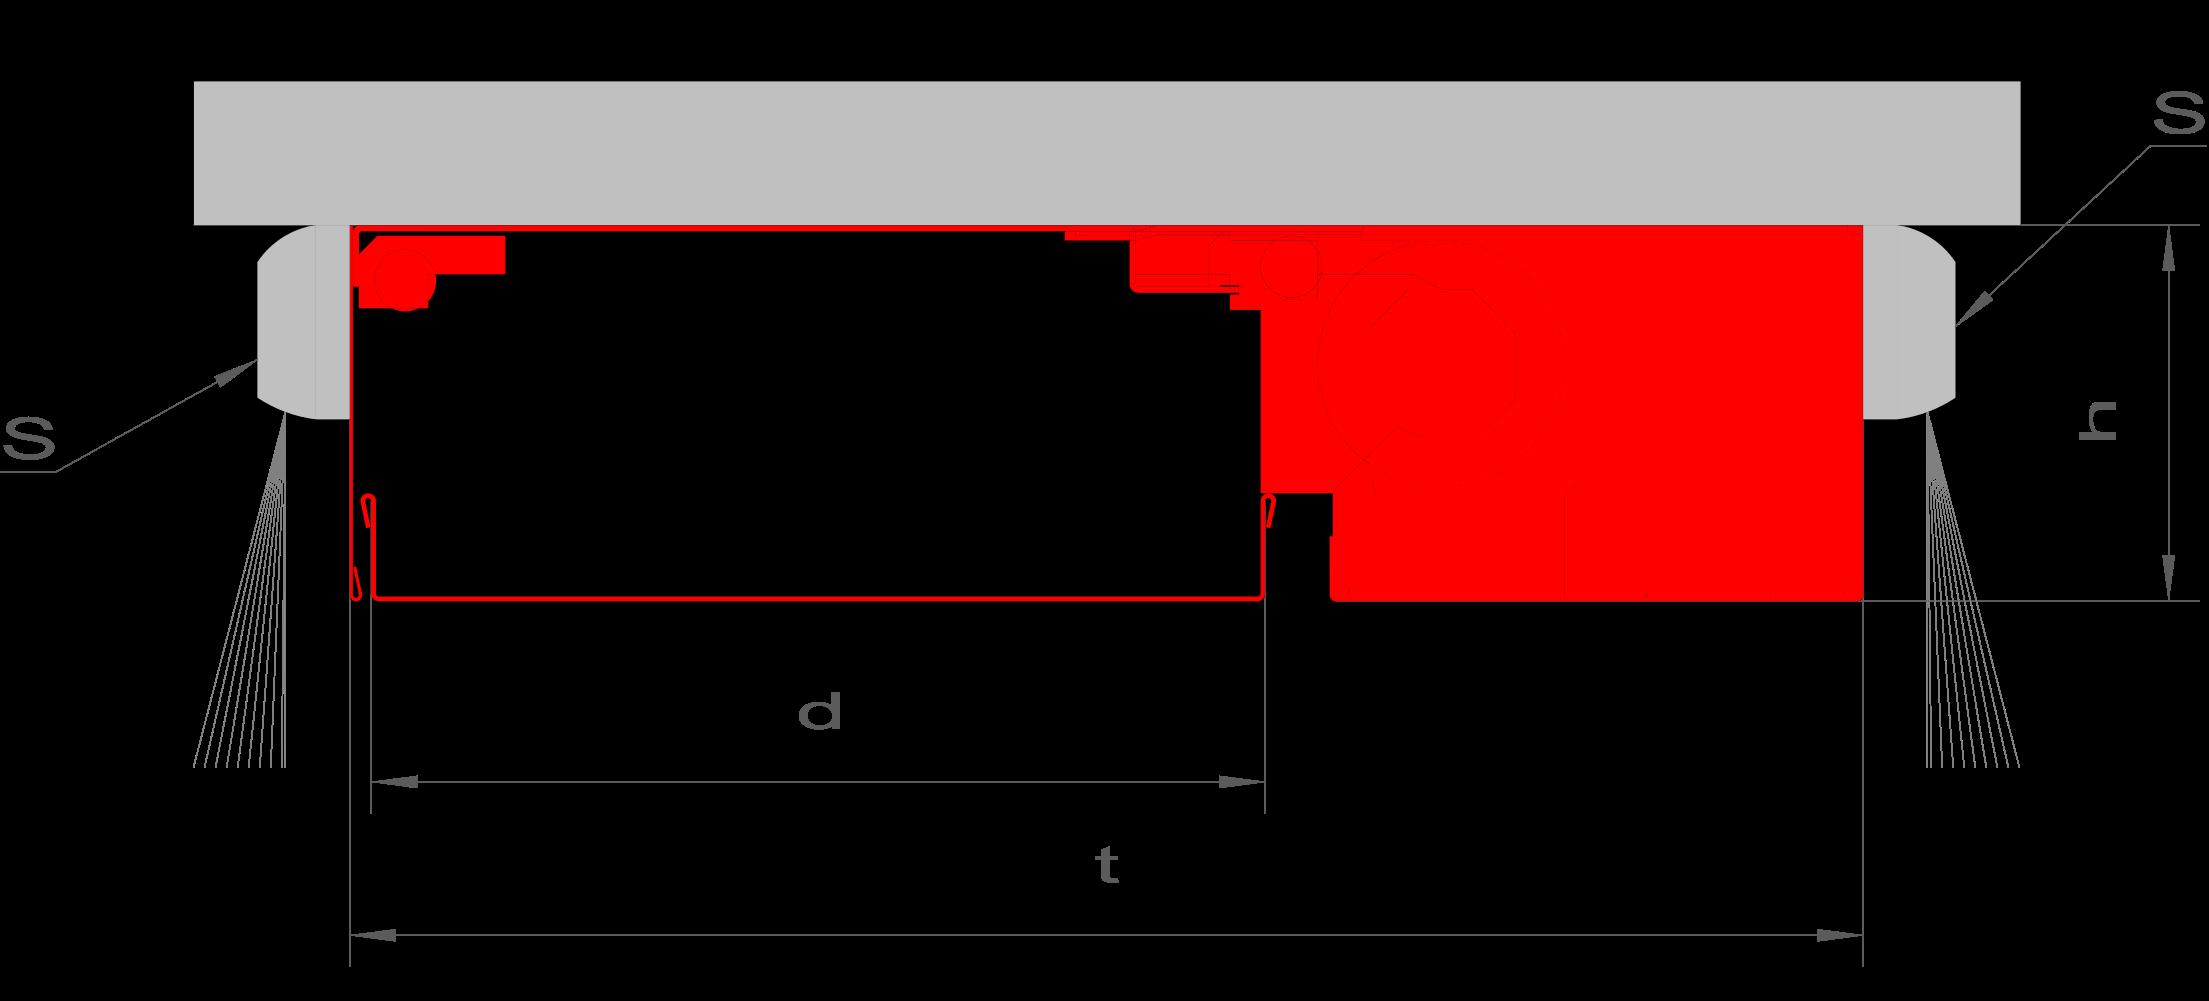 "{""h"":""125 mm"",""d"":""290 mm"",""t"":""490 mm"",""S"":""infračervené čidlo""}"